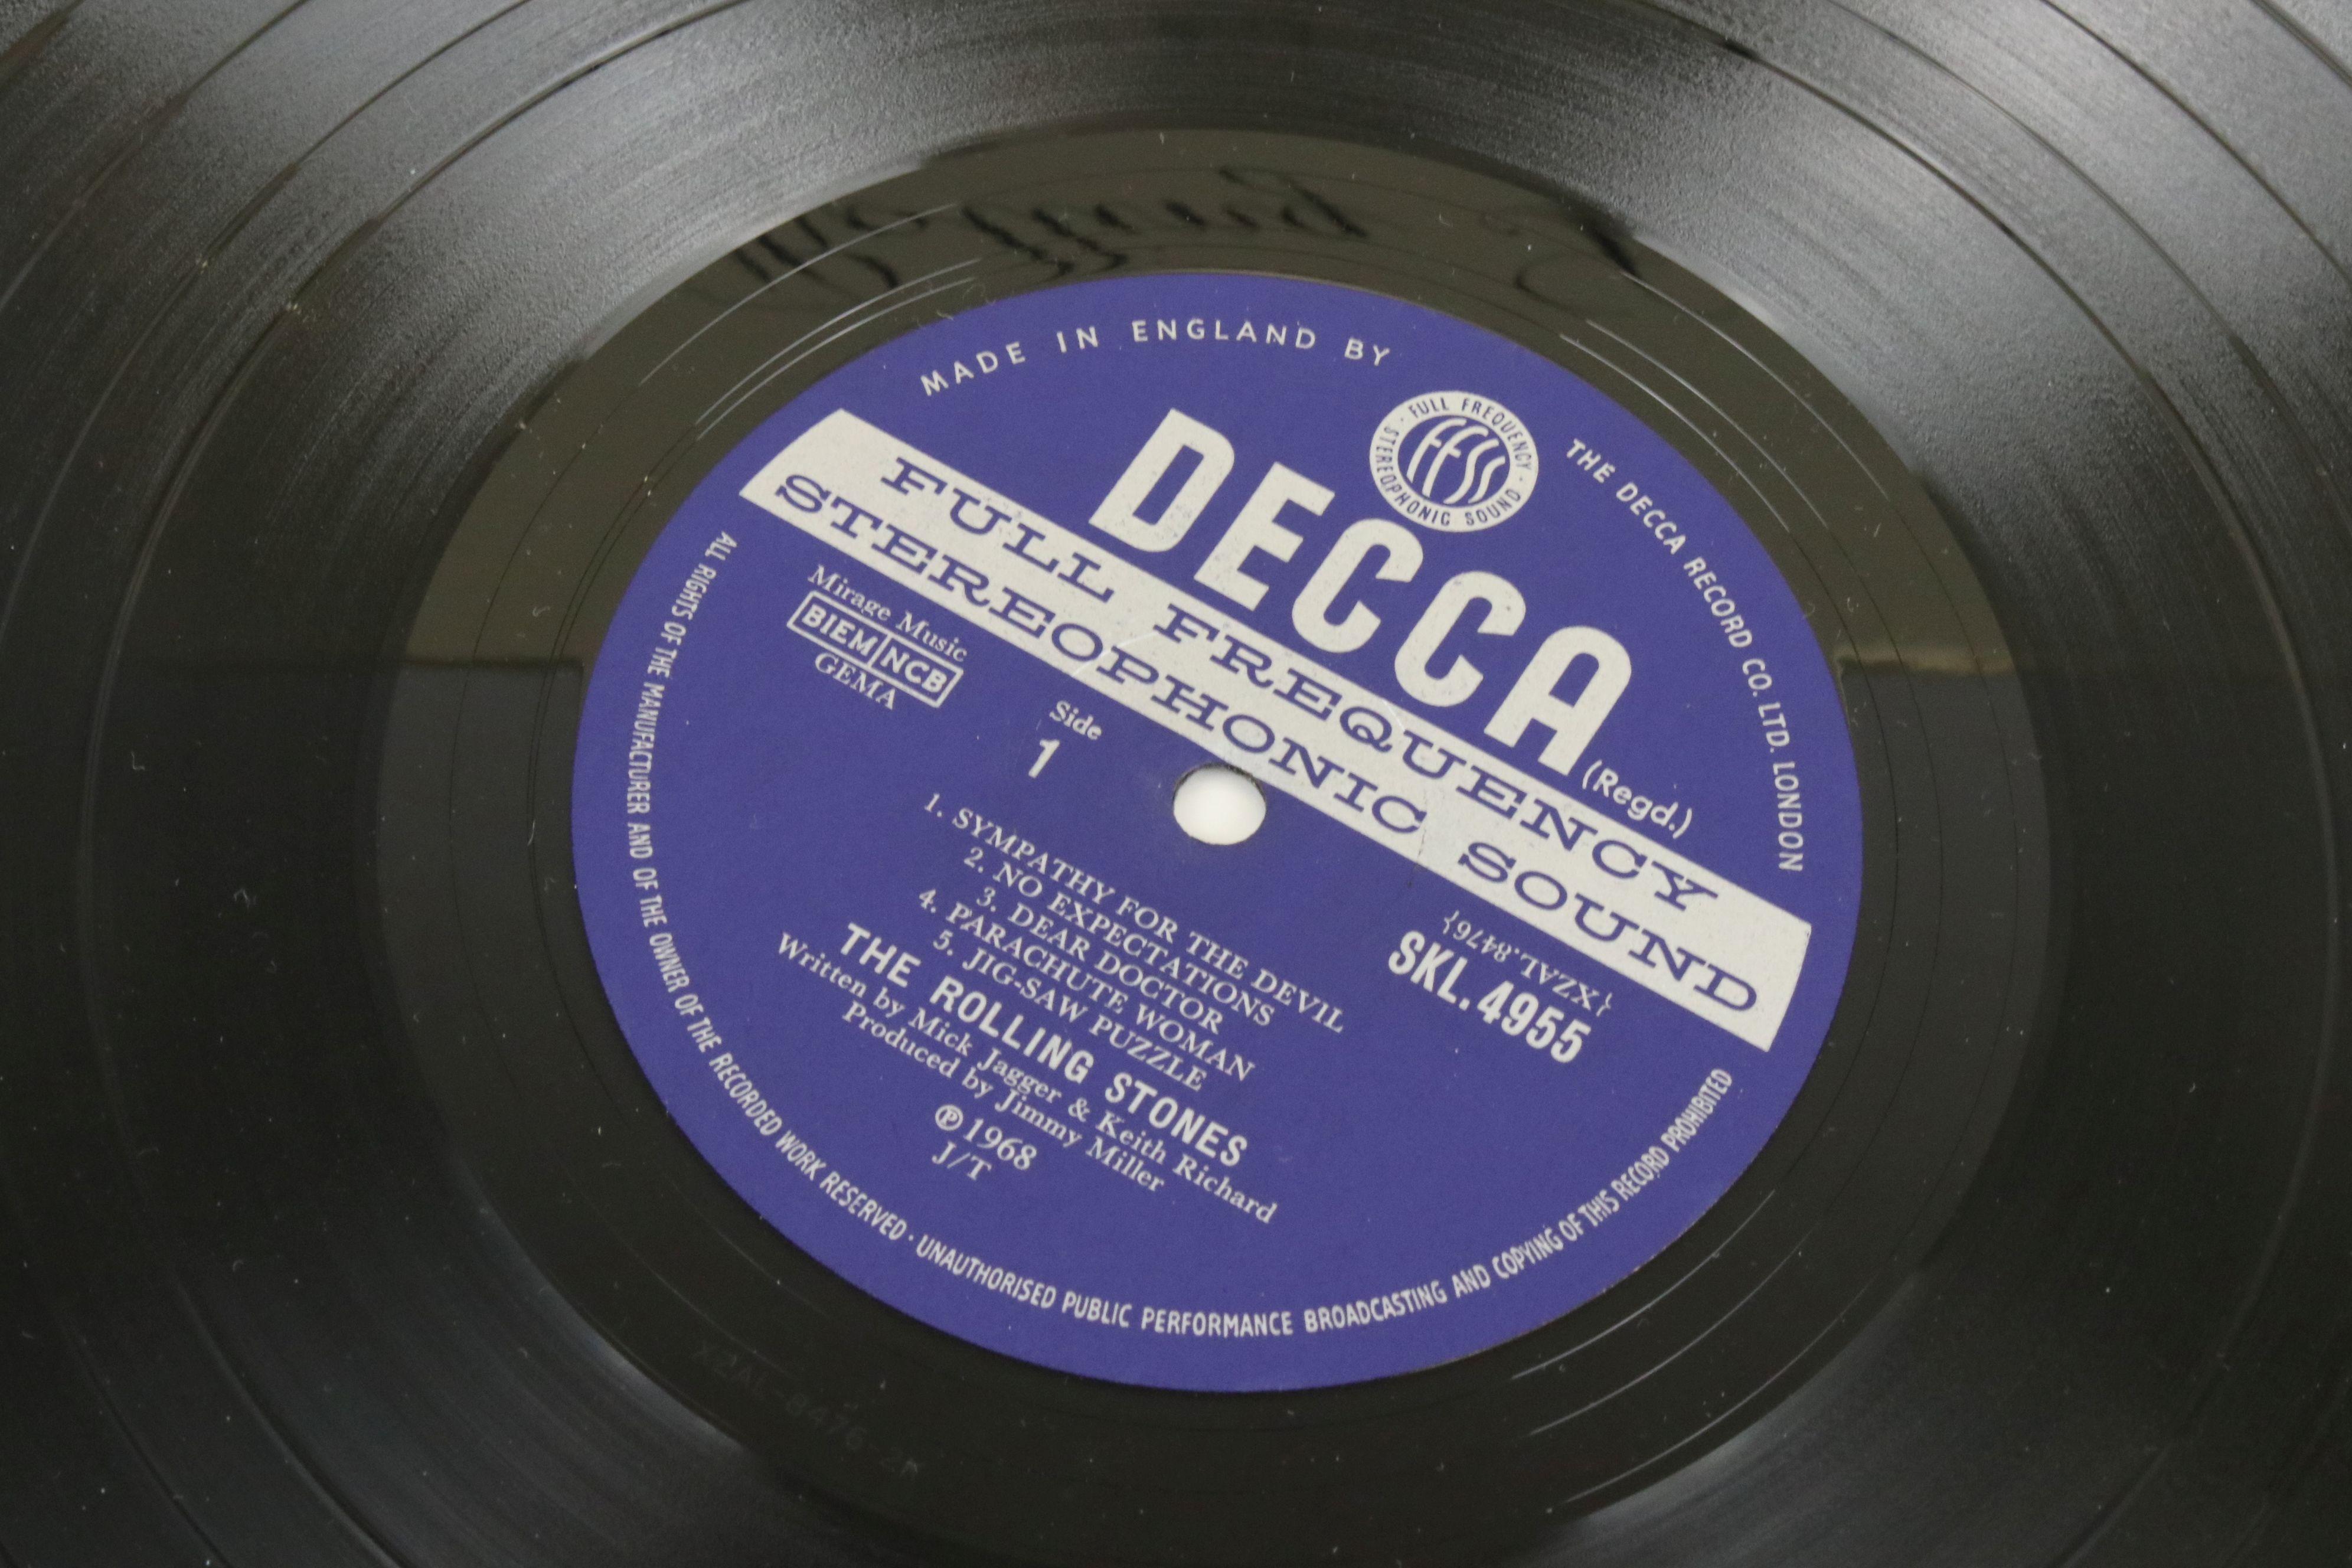 Vinyl - The Rolling Stones Beggars Banquet (SKL 4955) blue Decca label, Mirage Music, titles - Image 3 of 6